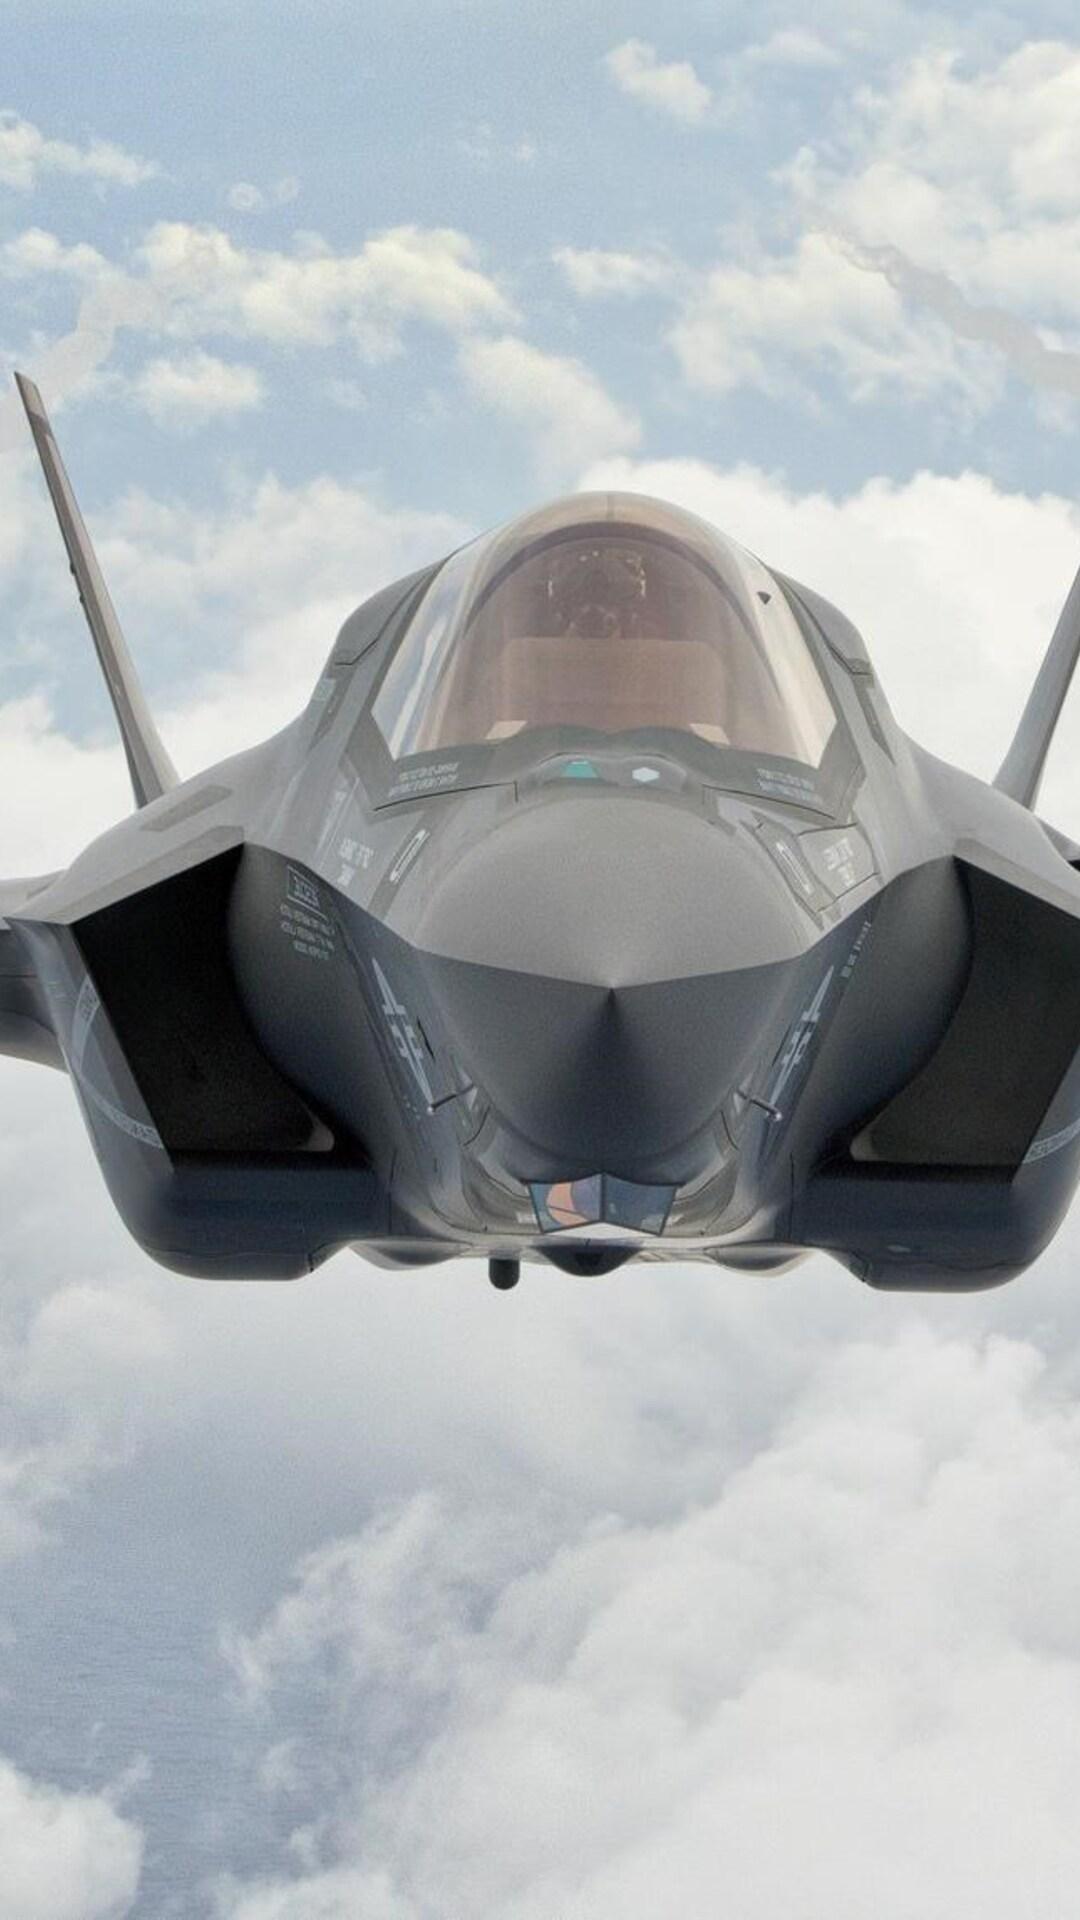 211x211 Lockheed Martin F 211 Lightning 21 Iphone 21,21s,21 Plus ...